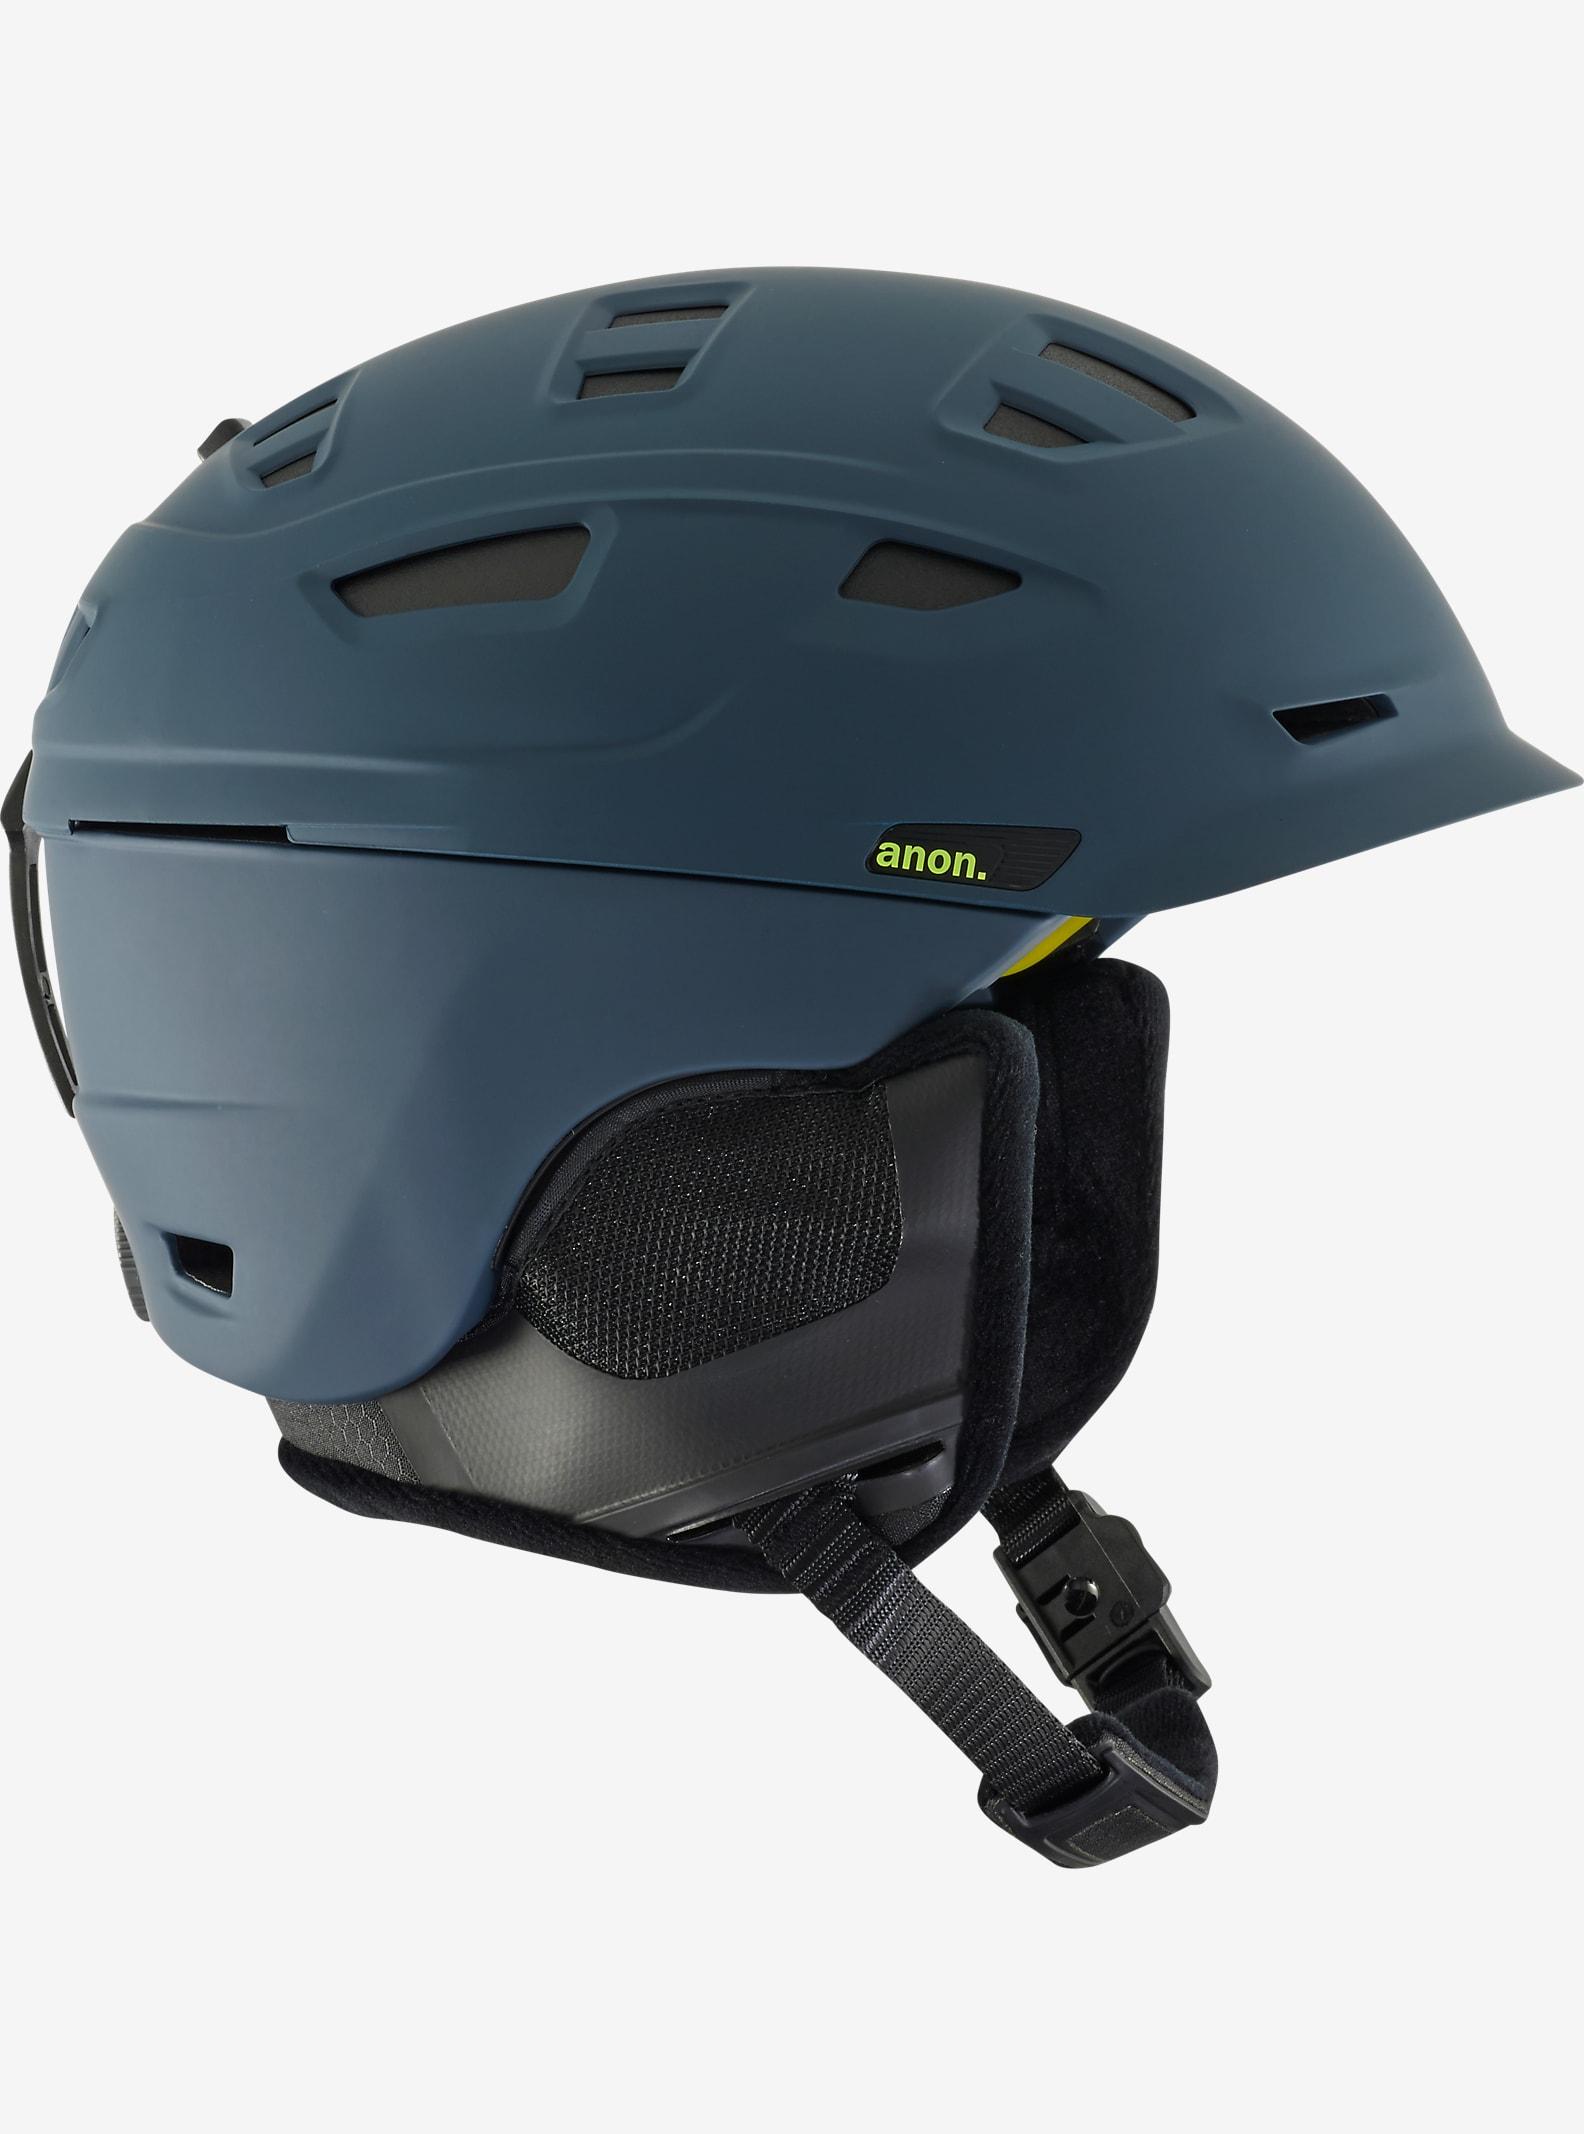 anon. Prime Helmet shown in Dark Blue